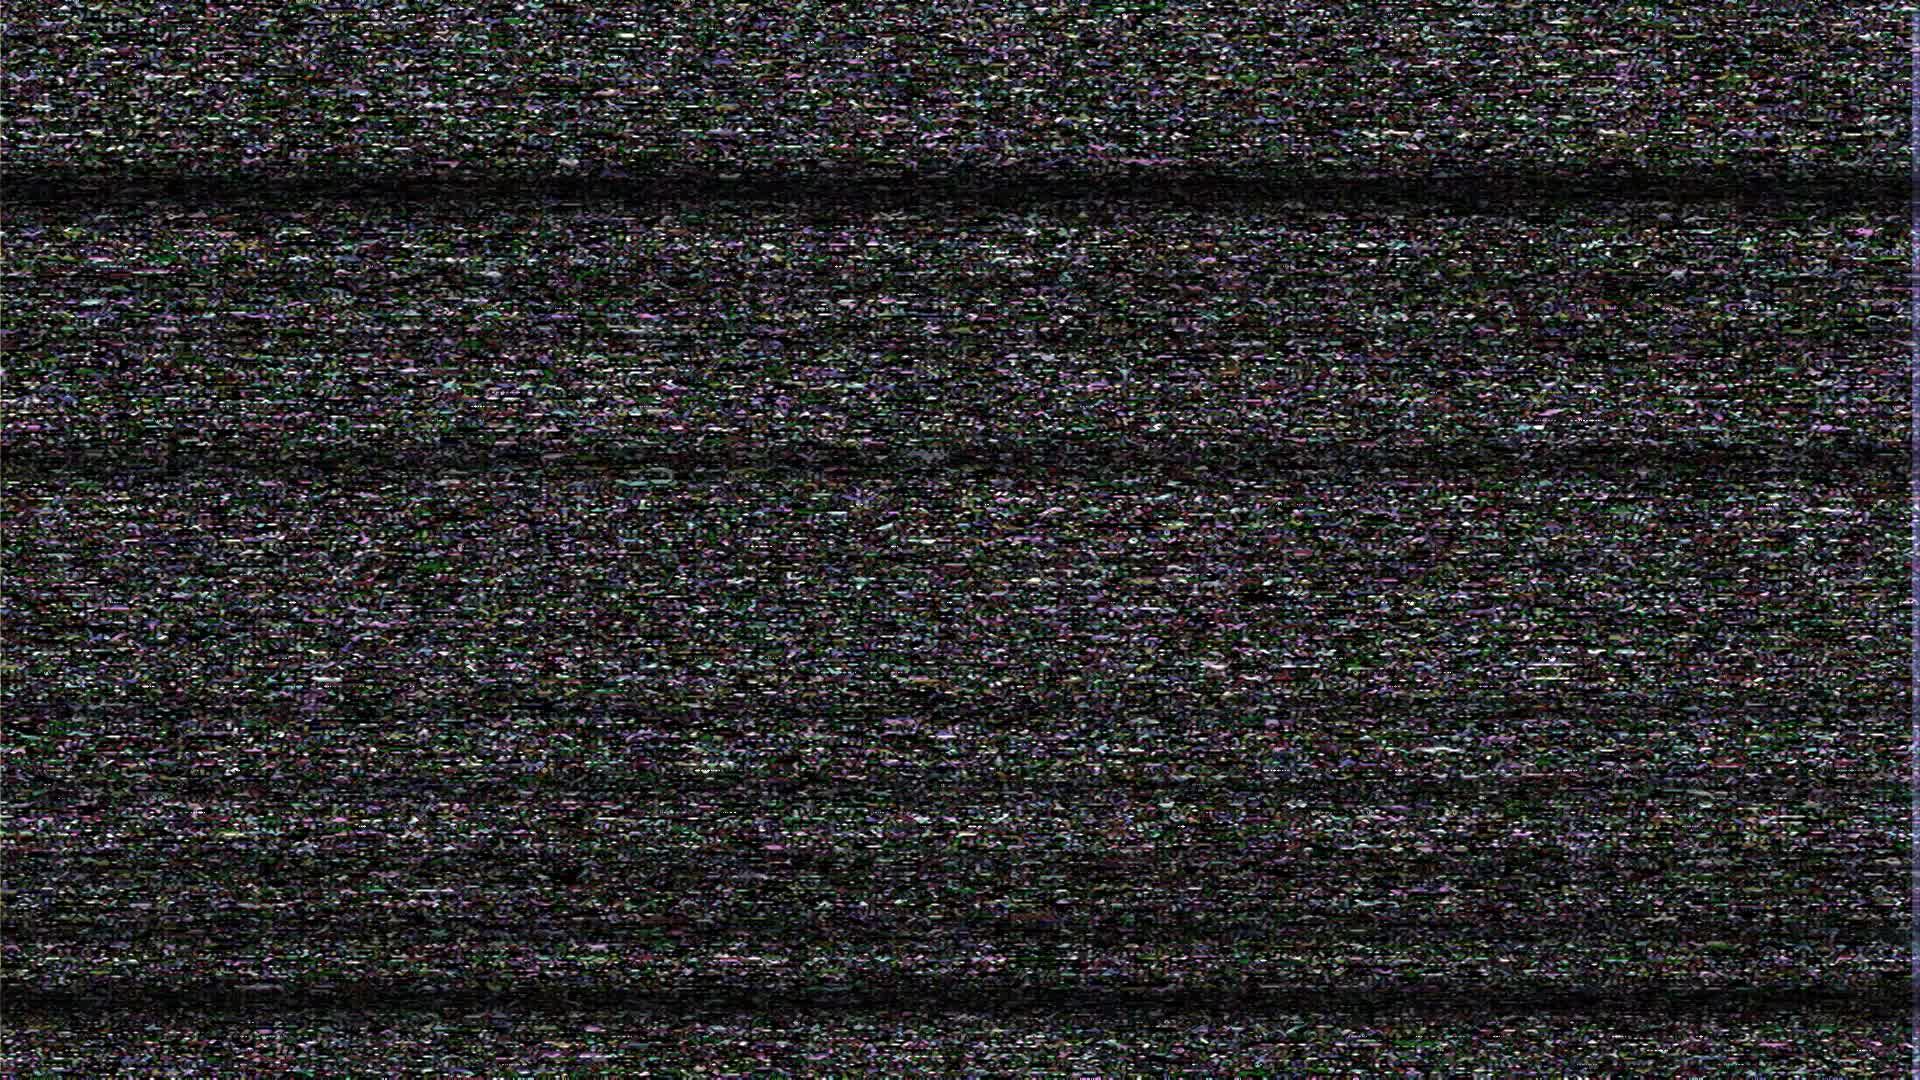 static wallpaper - photo #3